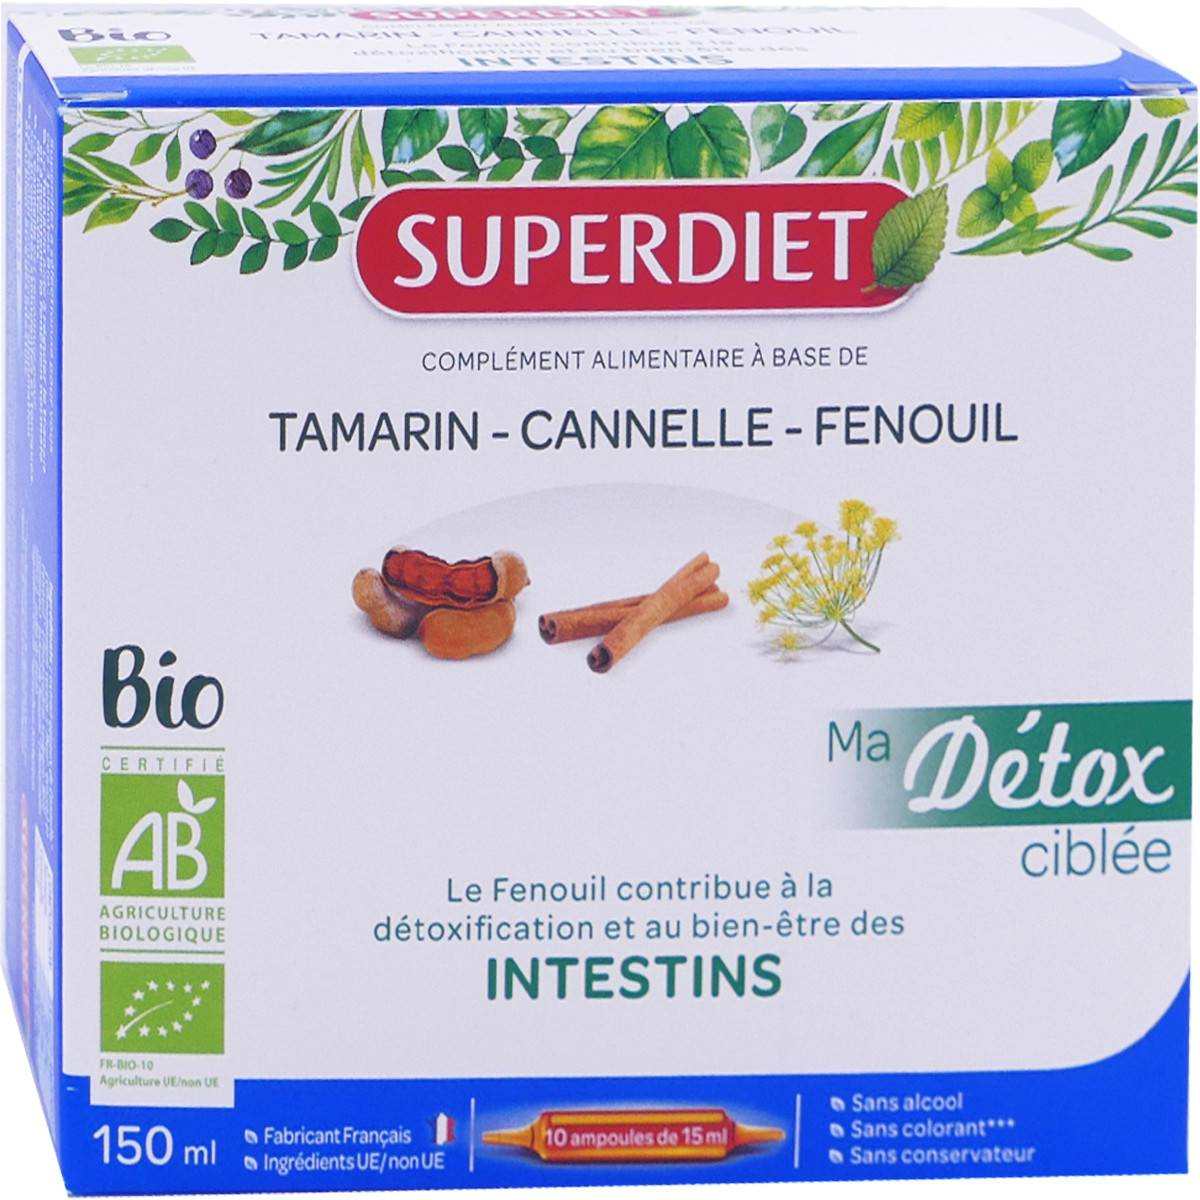 SUPER DIET Superdiet detox intestins 10 ampoules 15 ml bio